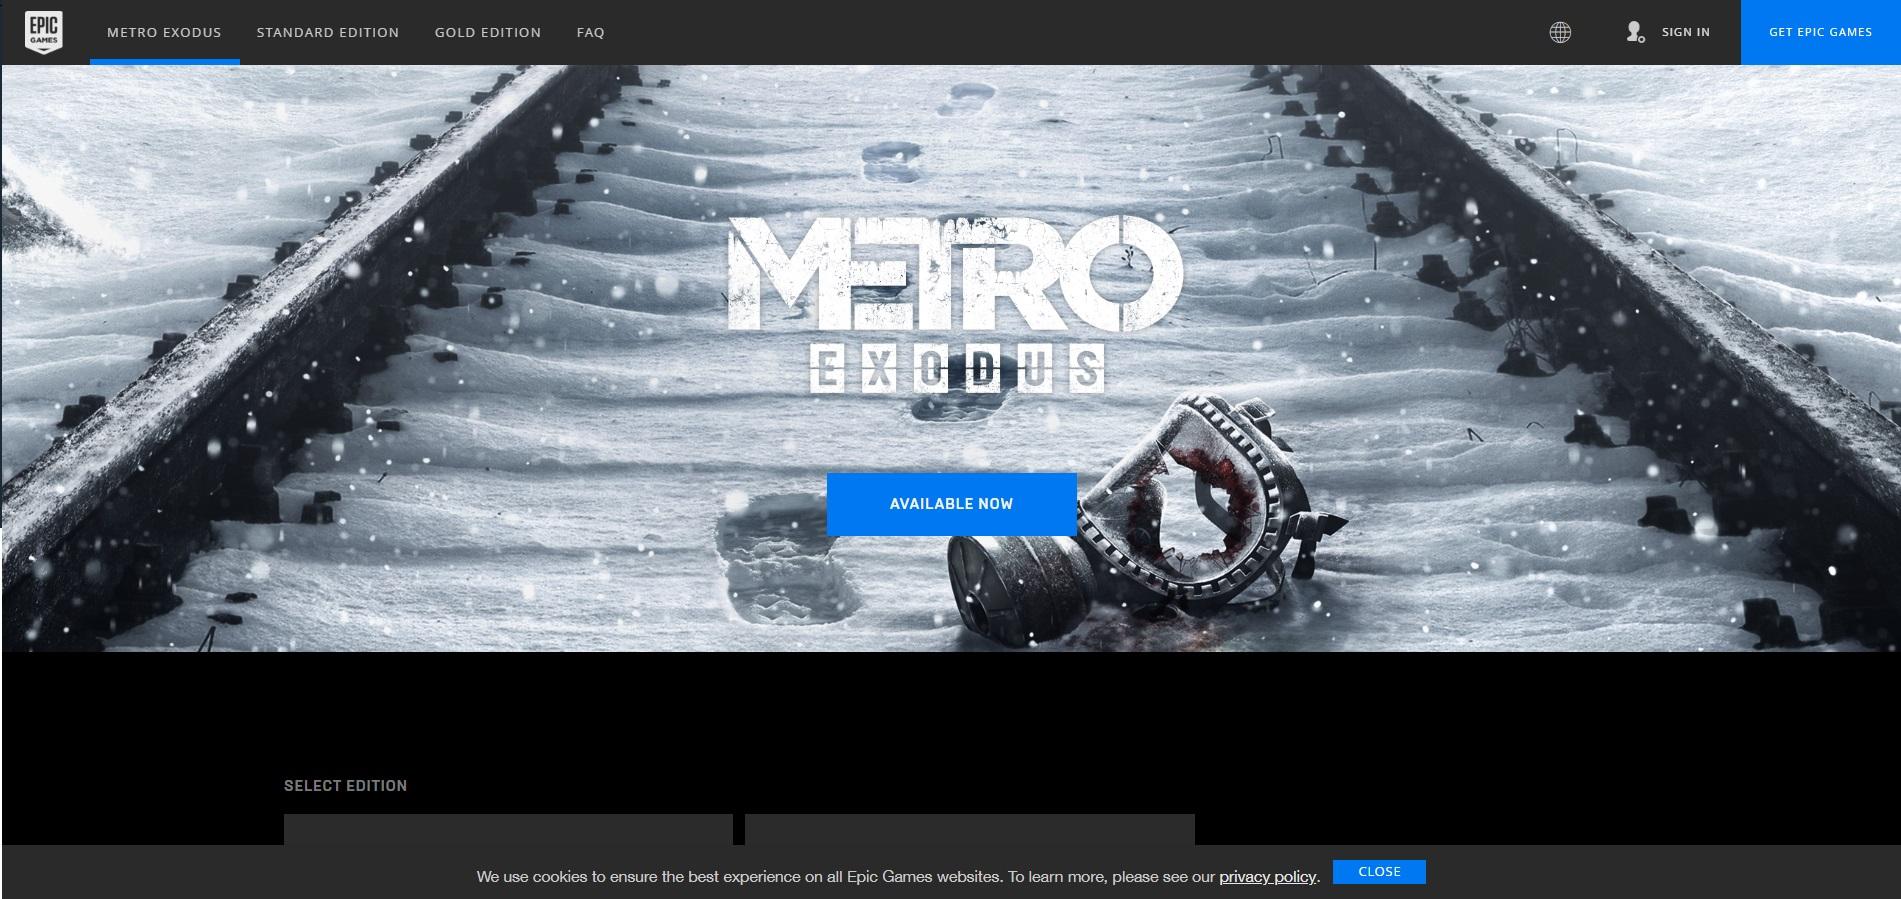 Metro Exodus' Epic Games' store page